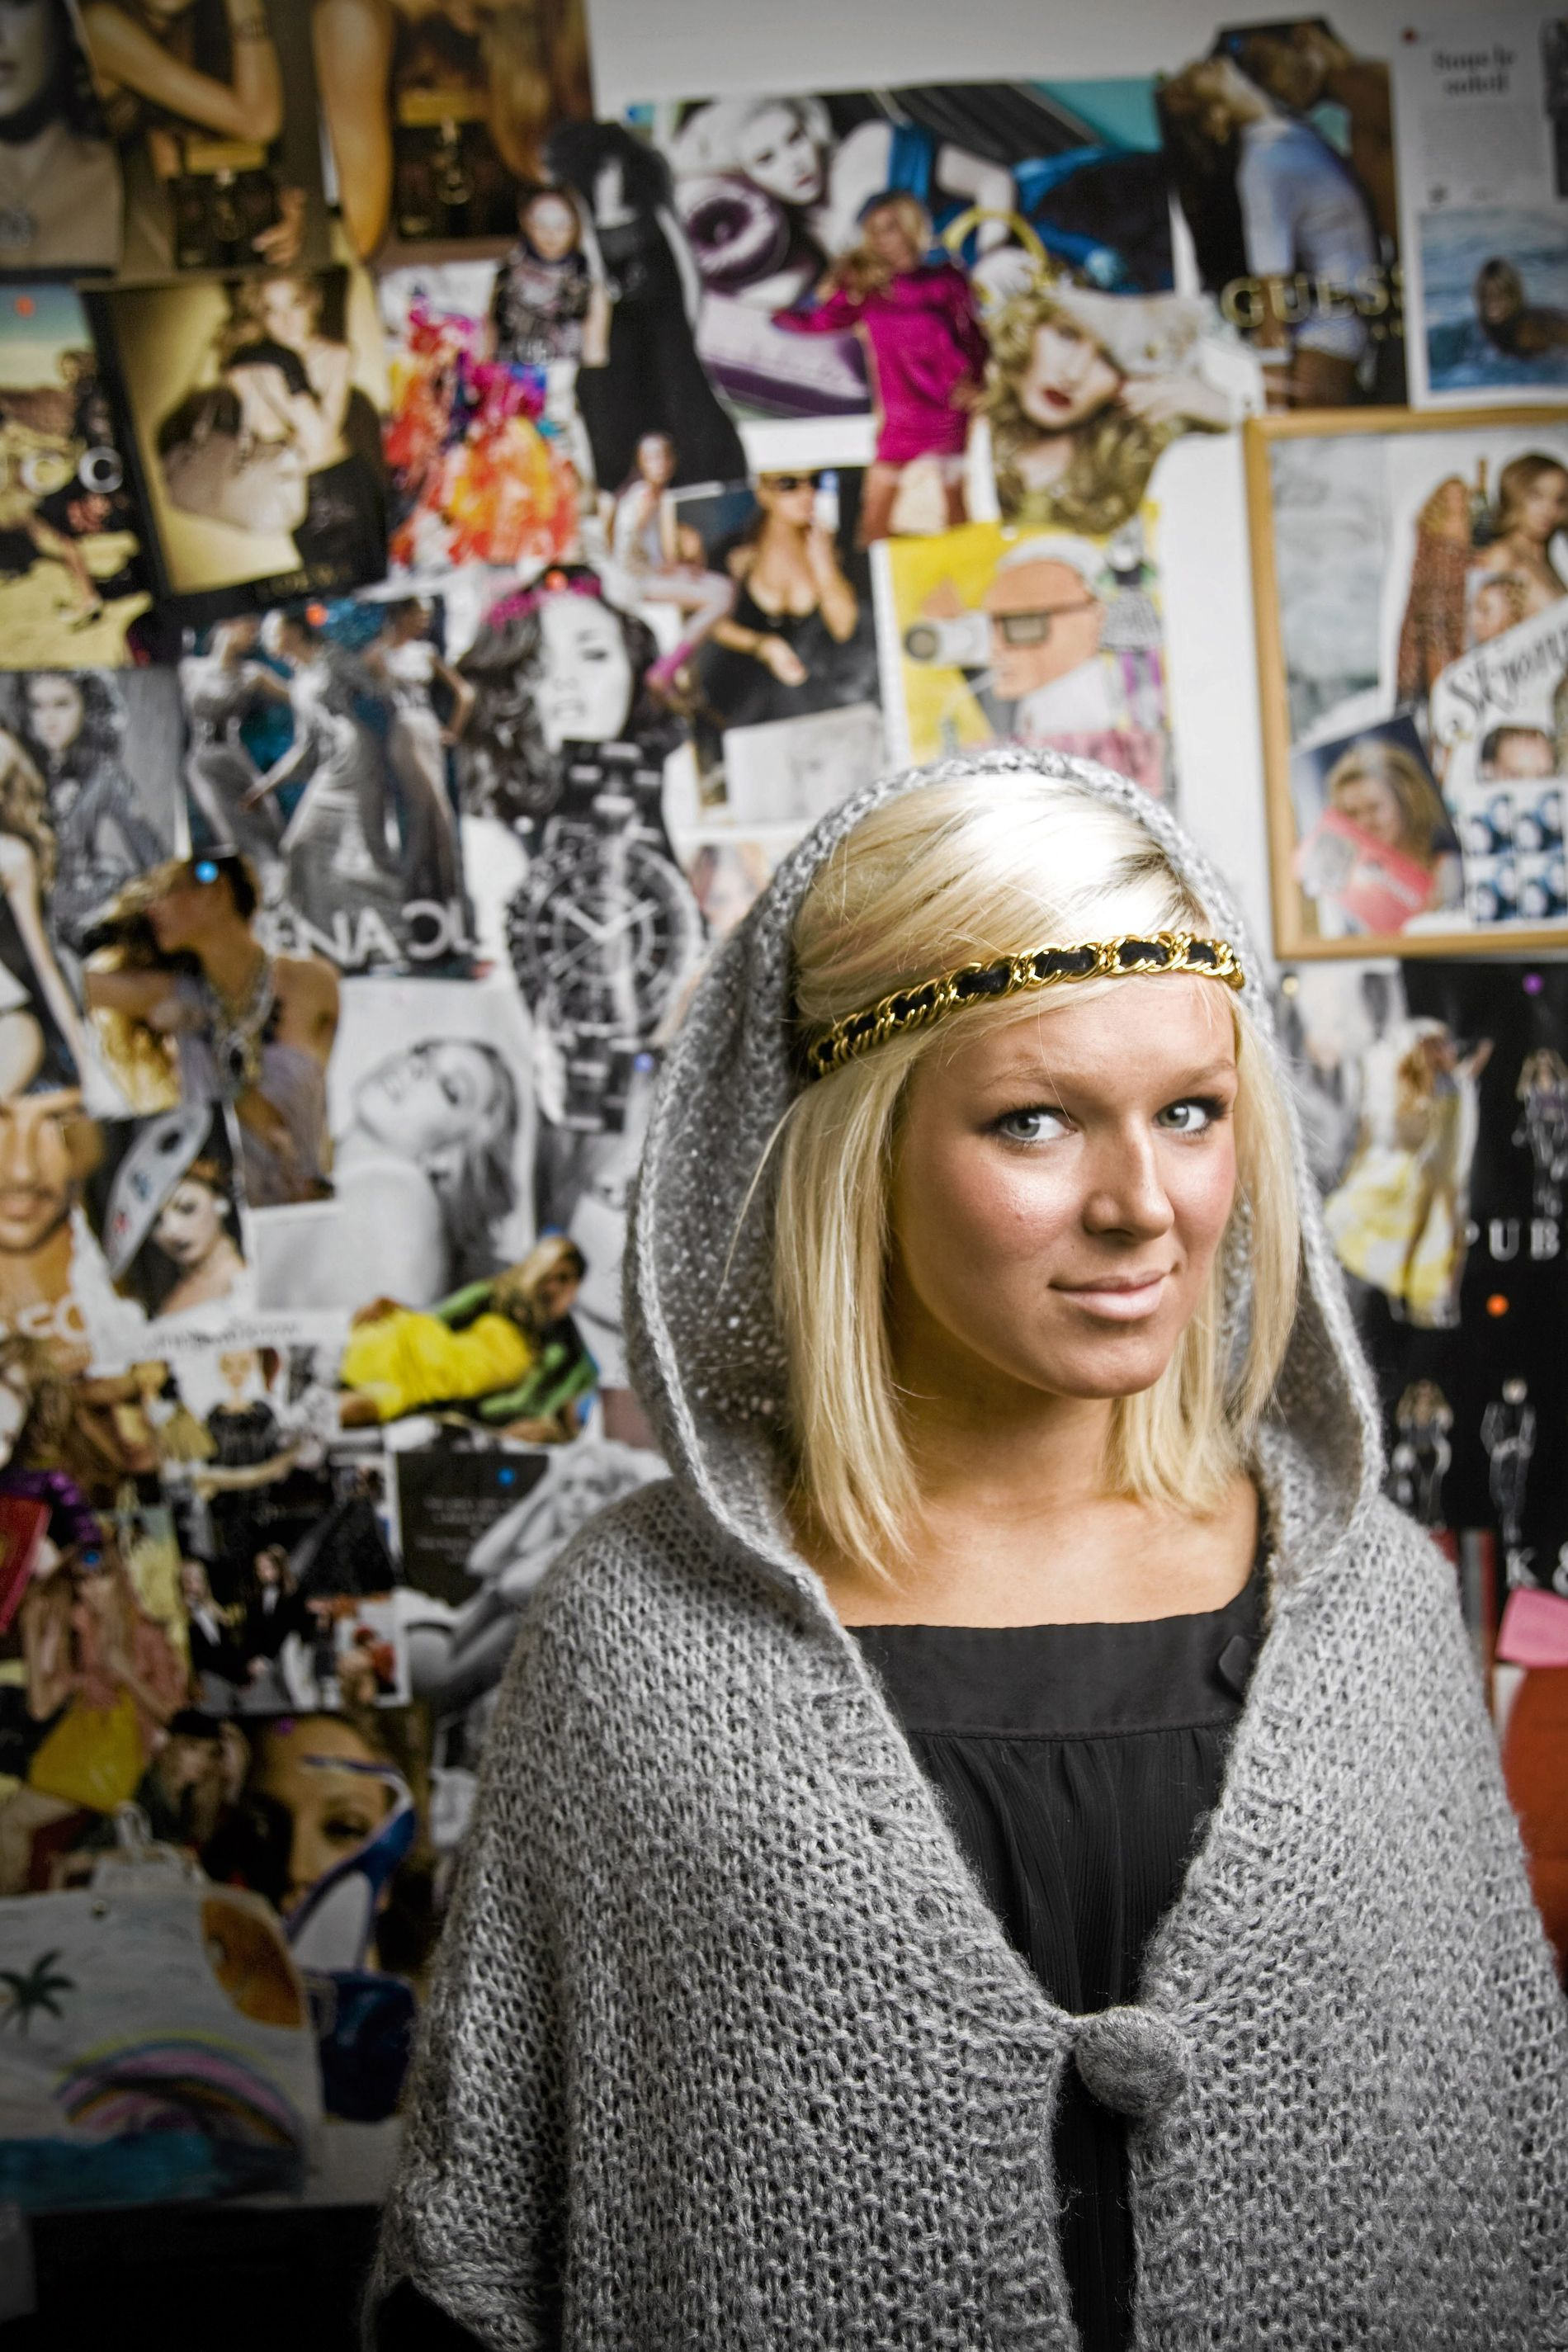 KJENDISBLOGGER: Ulrikke Lund har Norges fjerde største blogg, med 40.000 daglige lesere.